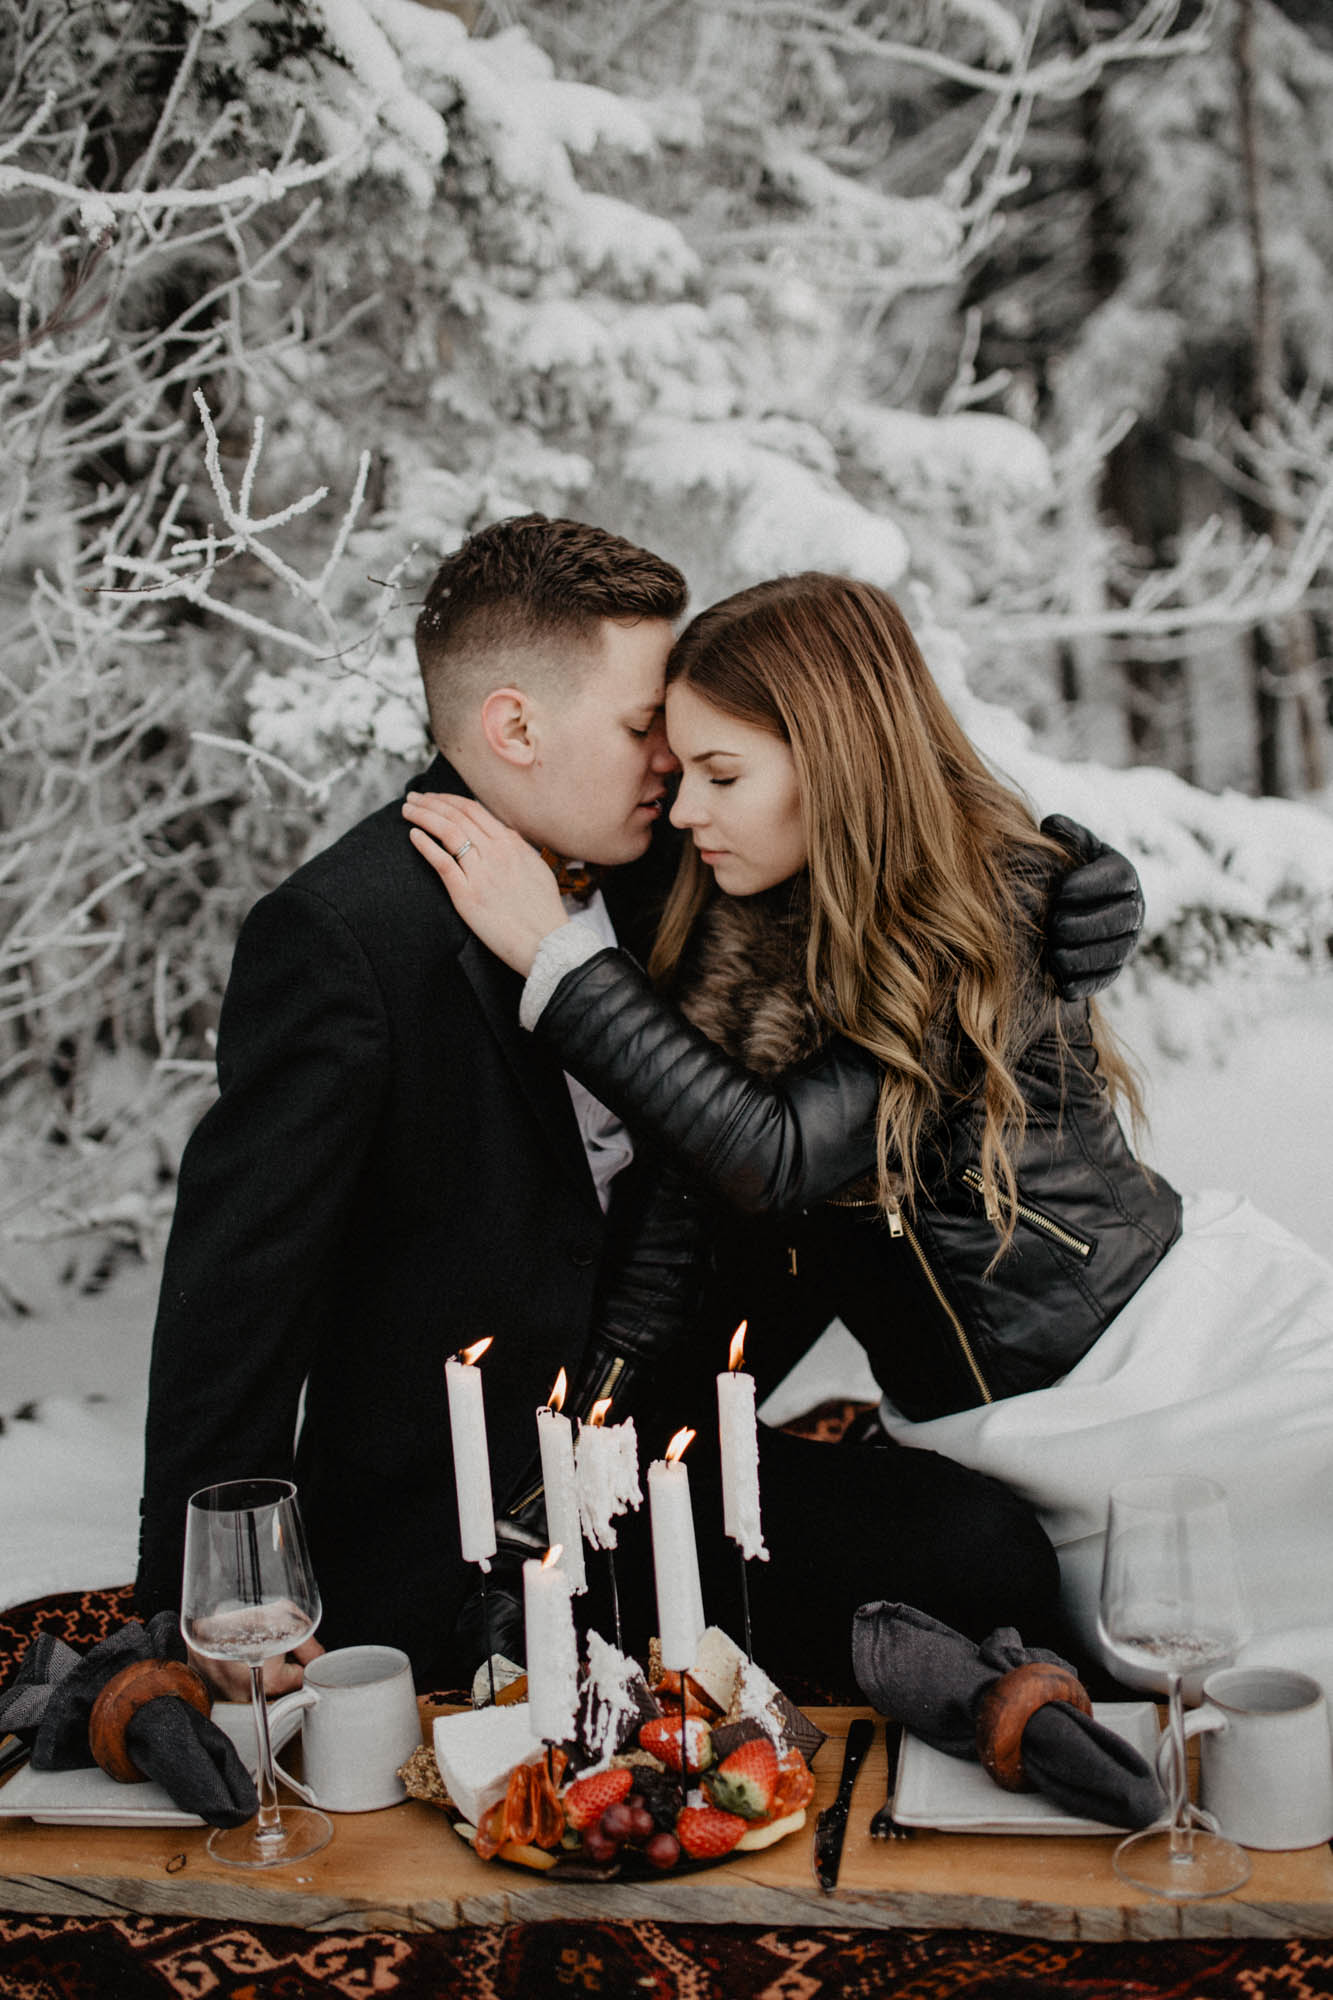 ashley_schulman_photography-winter_wedding_tampere-58.jpg